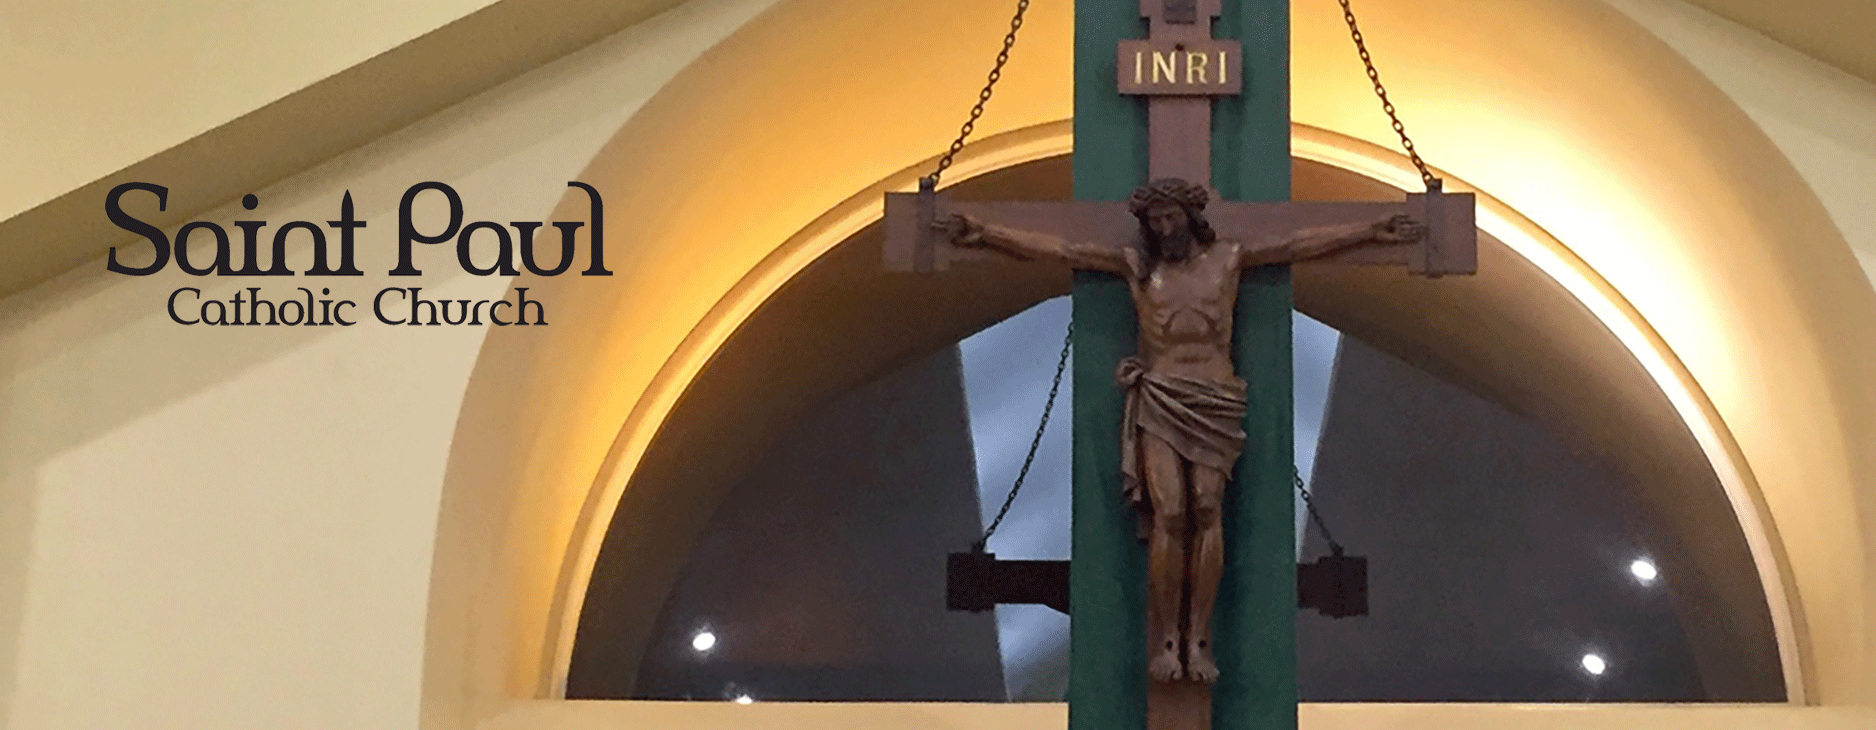 St Paul Cathloic Church